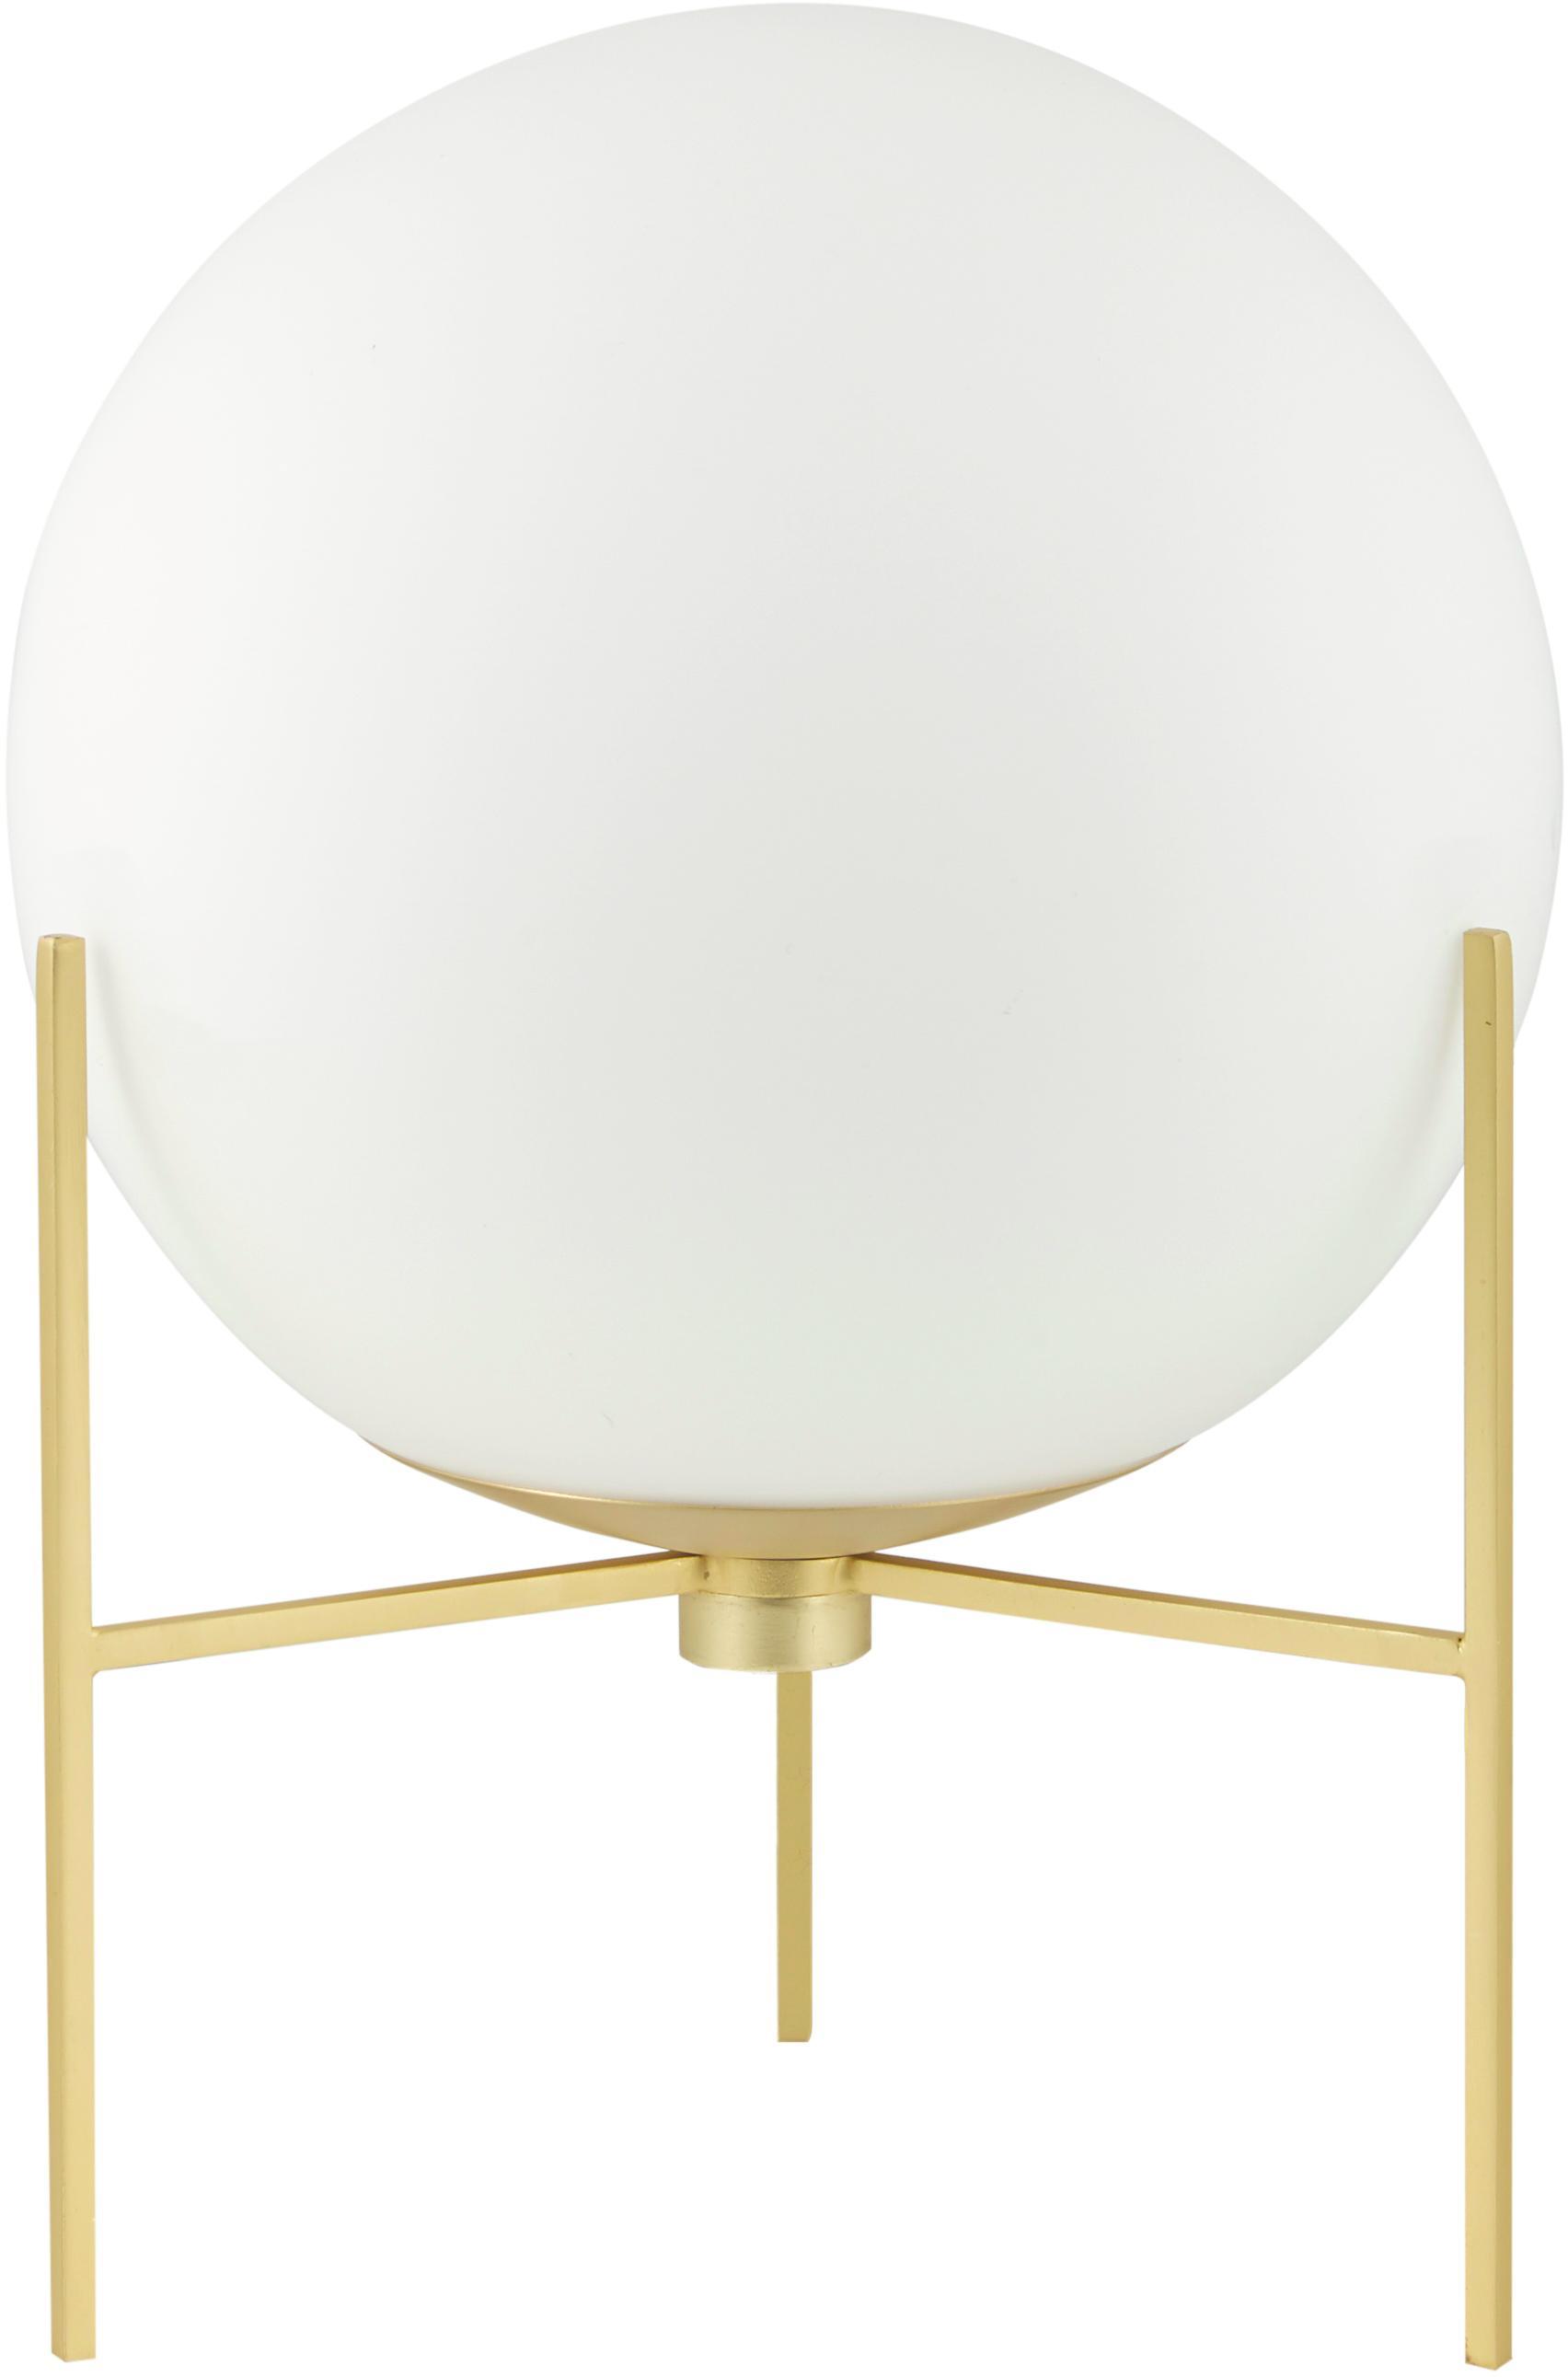 Lámpara de mesa de vidrio opalino Alton, Latón, blanco, Ø 20 x Al 29 cm